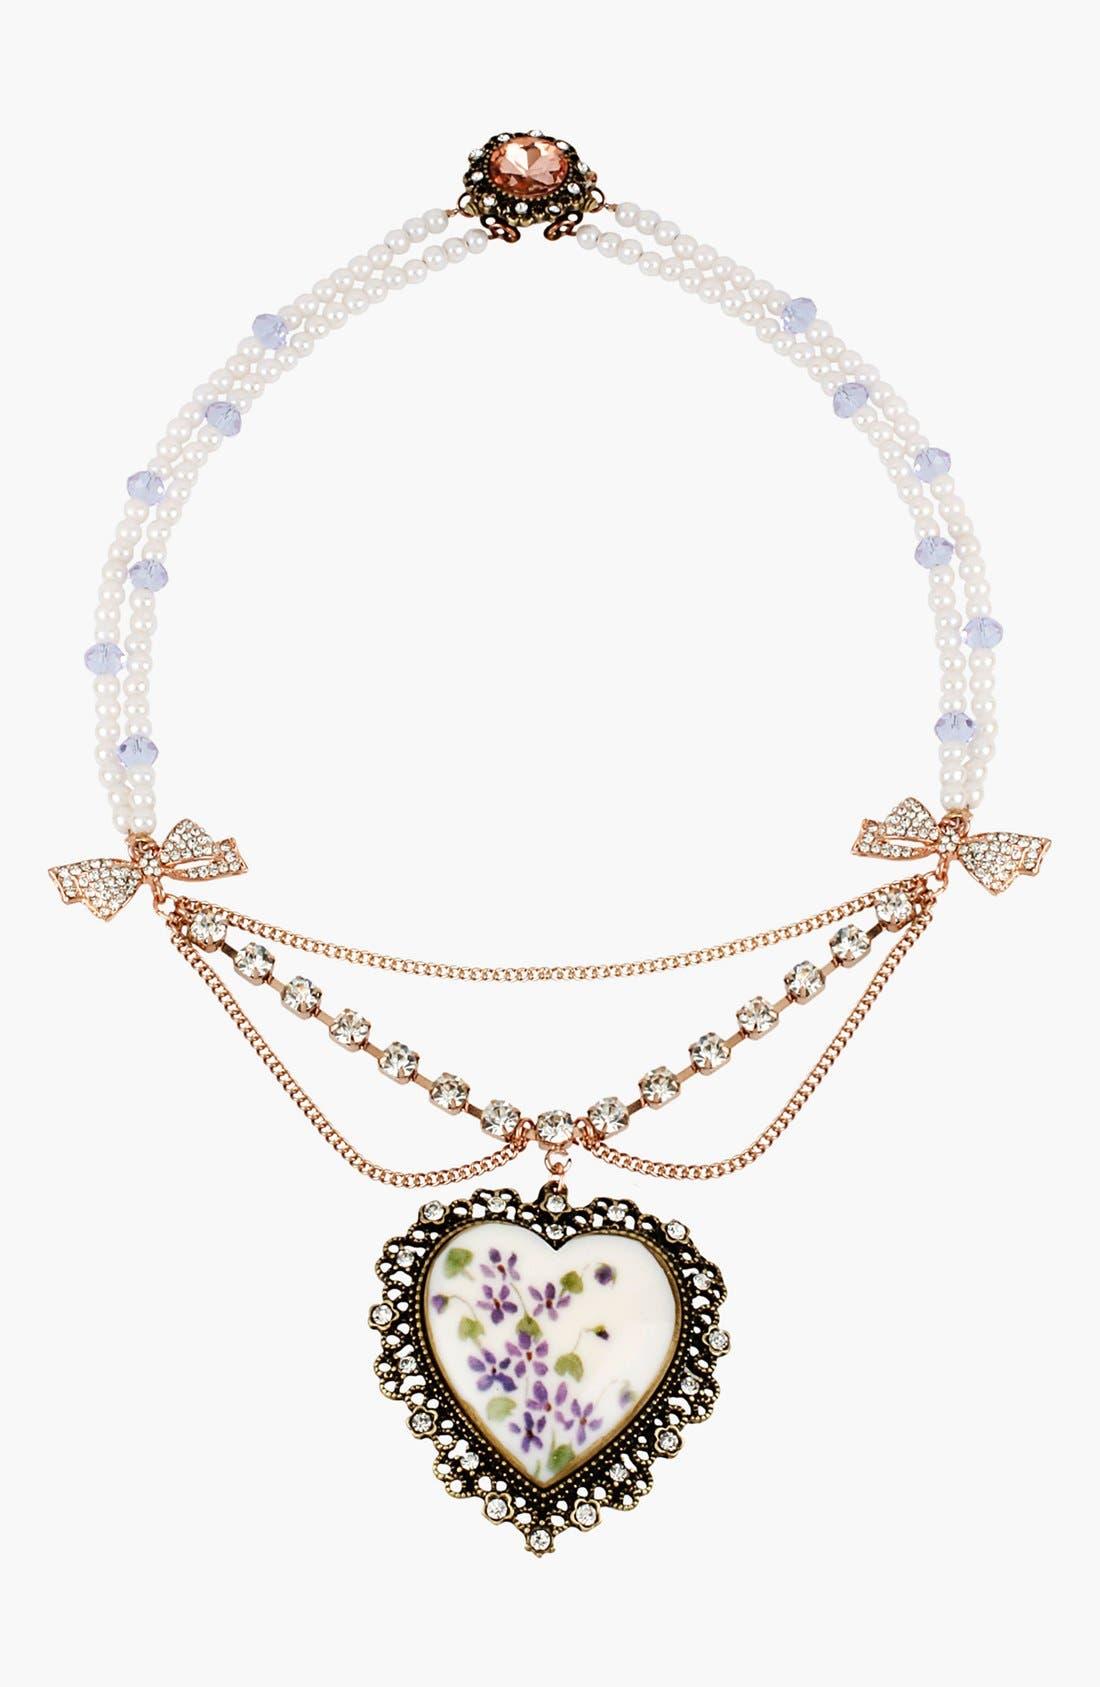 Main Image - Betsey Johnson 'Vintage Bow' Heart Pendant Necklace